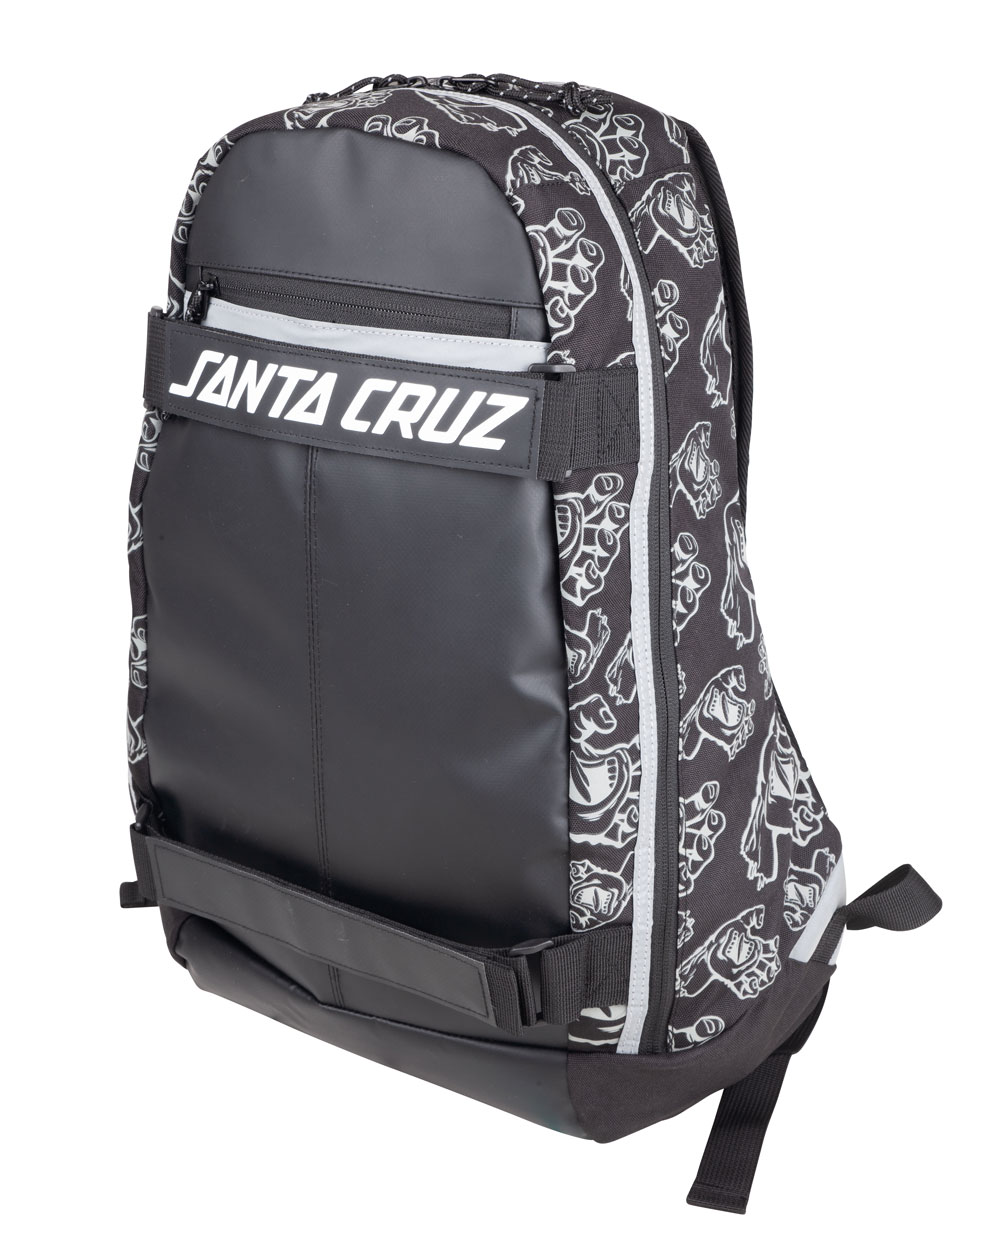 Santa Cruz Dispatch Skateboard Backpack Black